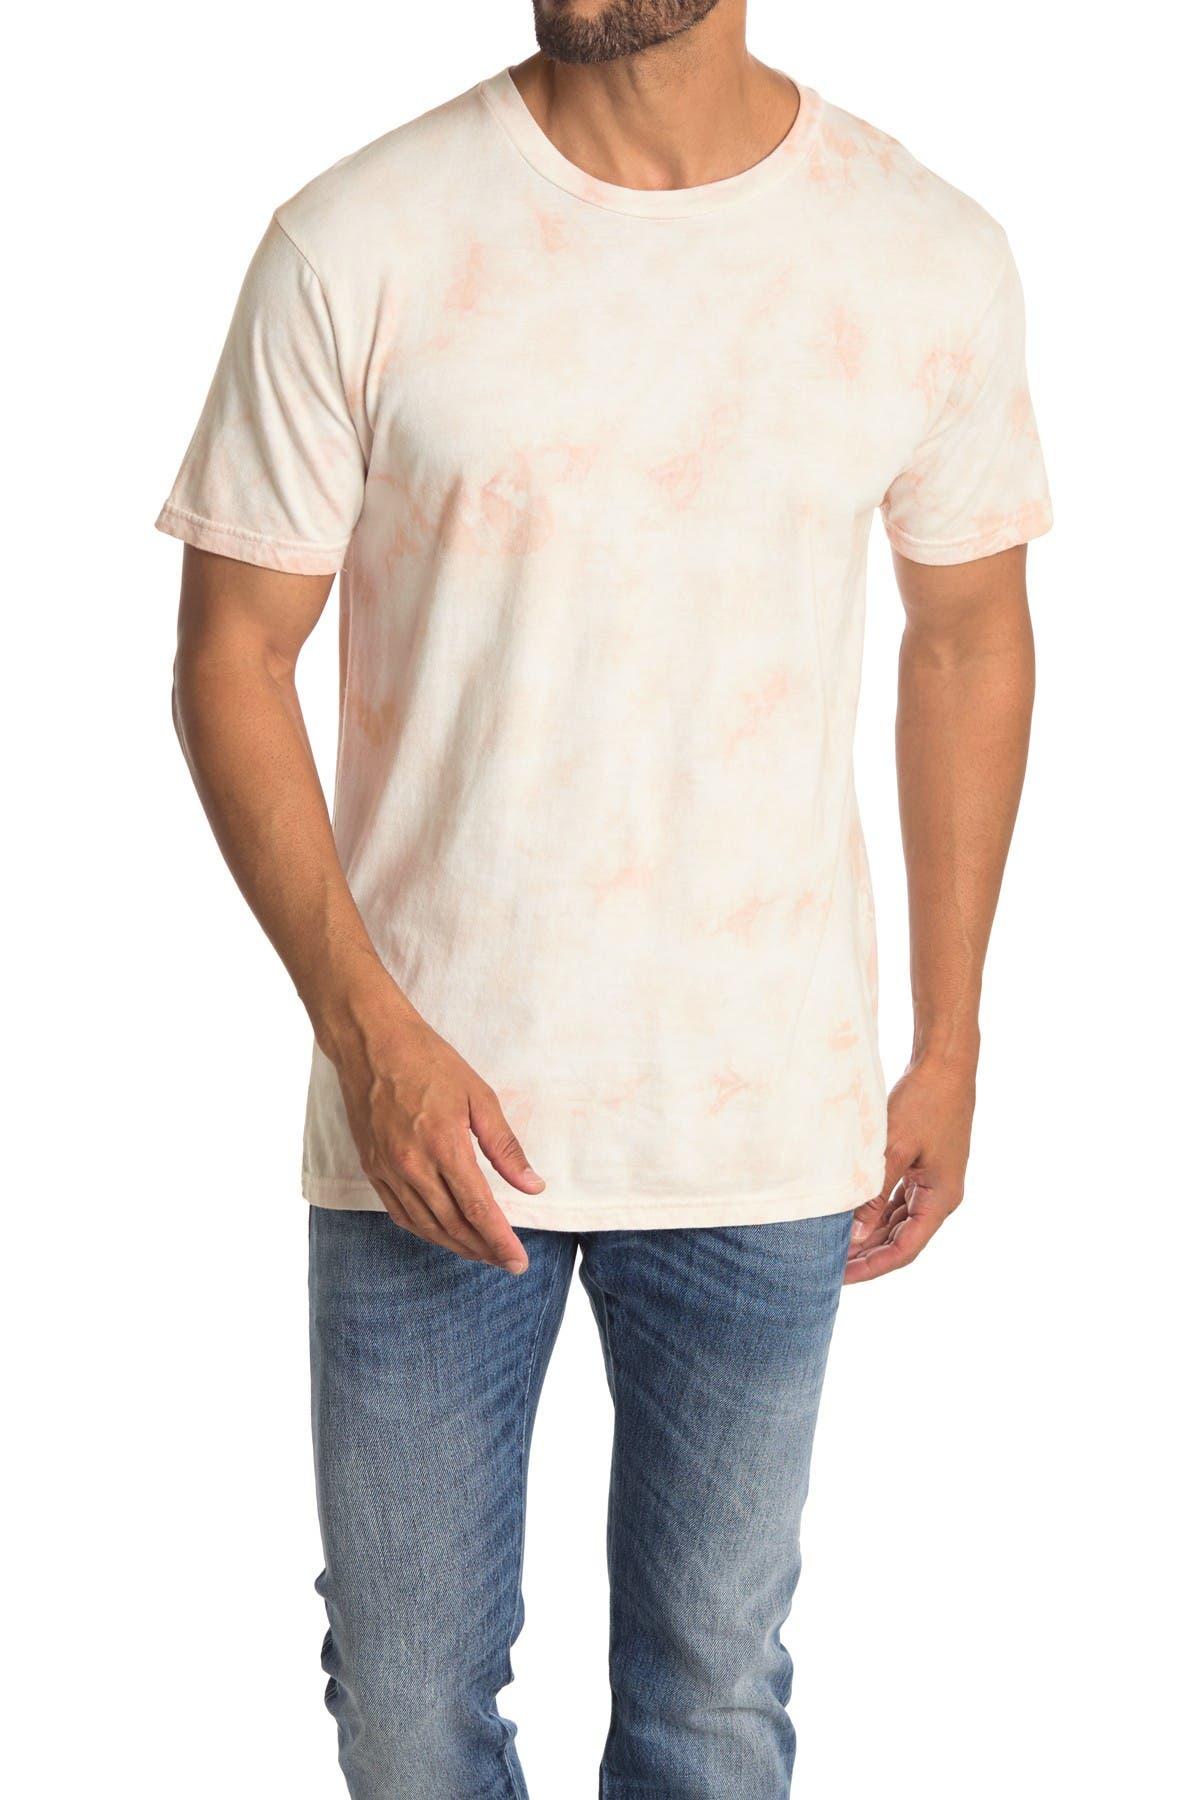 Image of Original Paperbacks South Sea Tie Dye Print T-Shirt